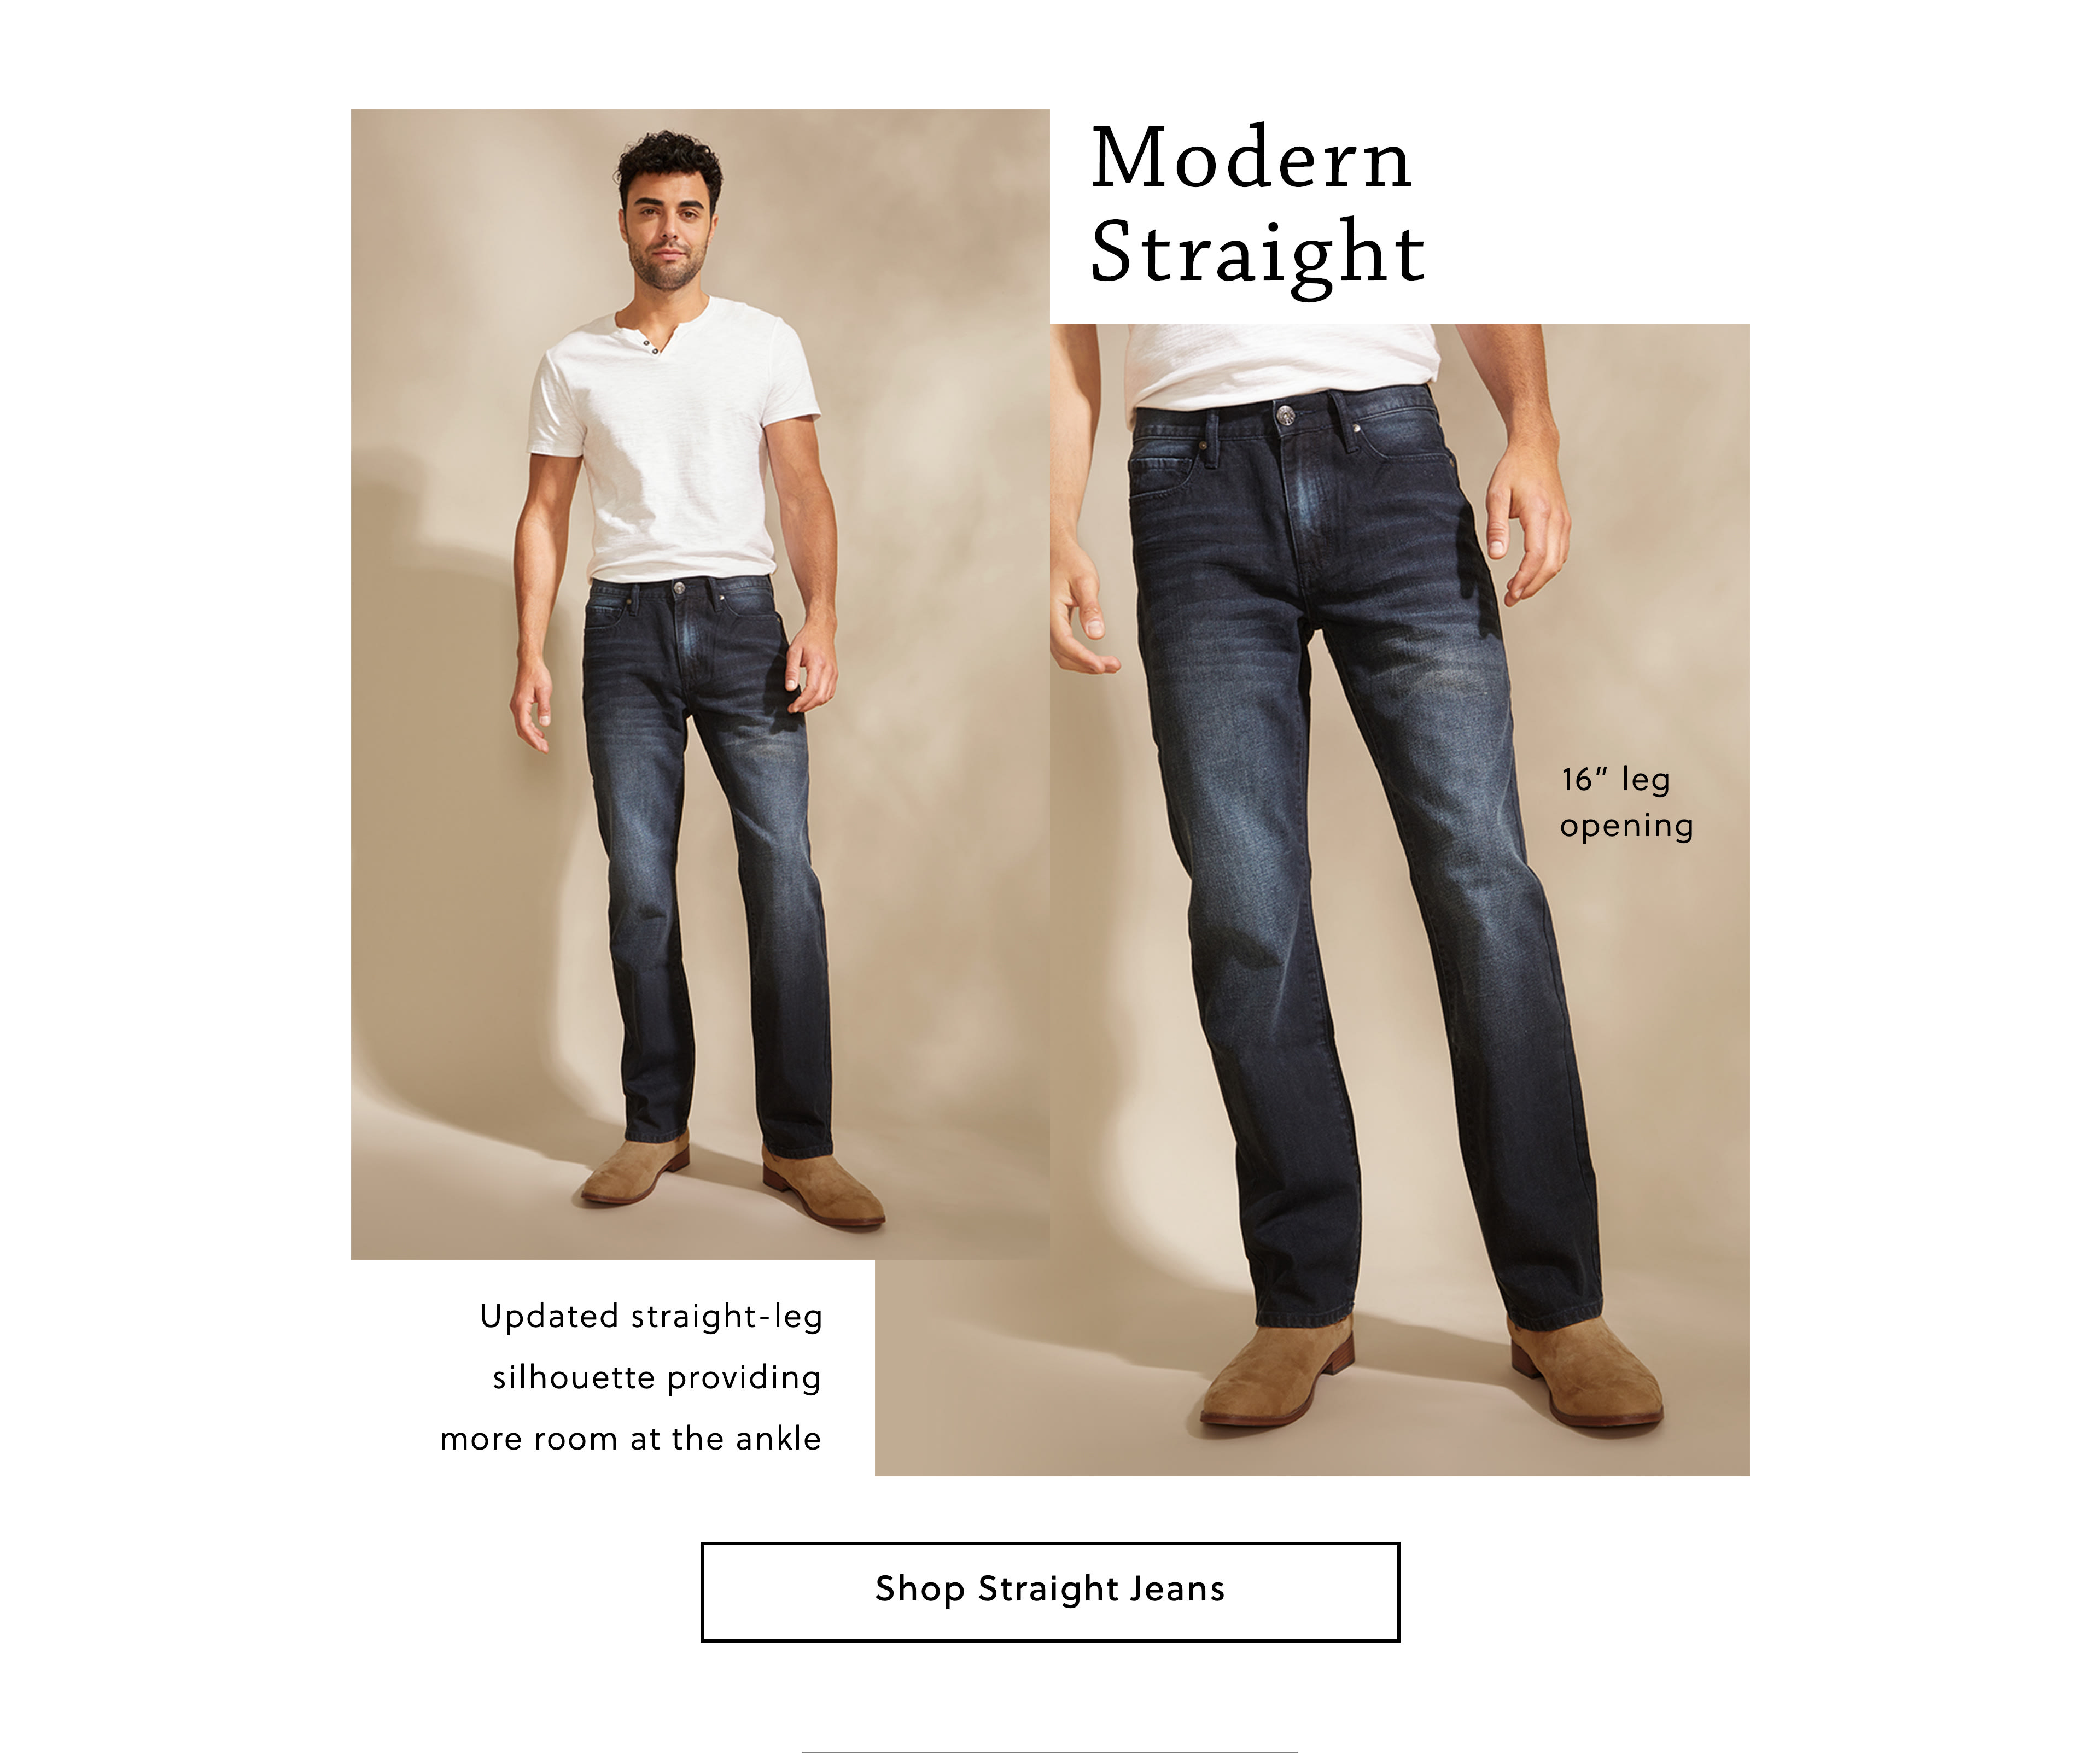 Modern Straight